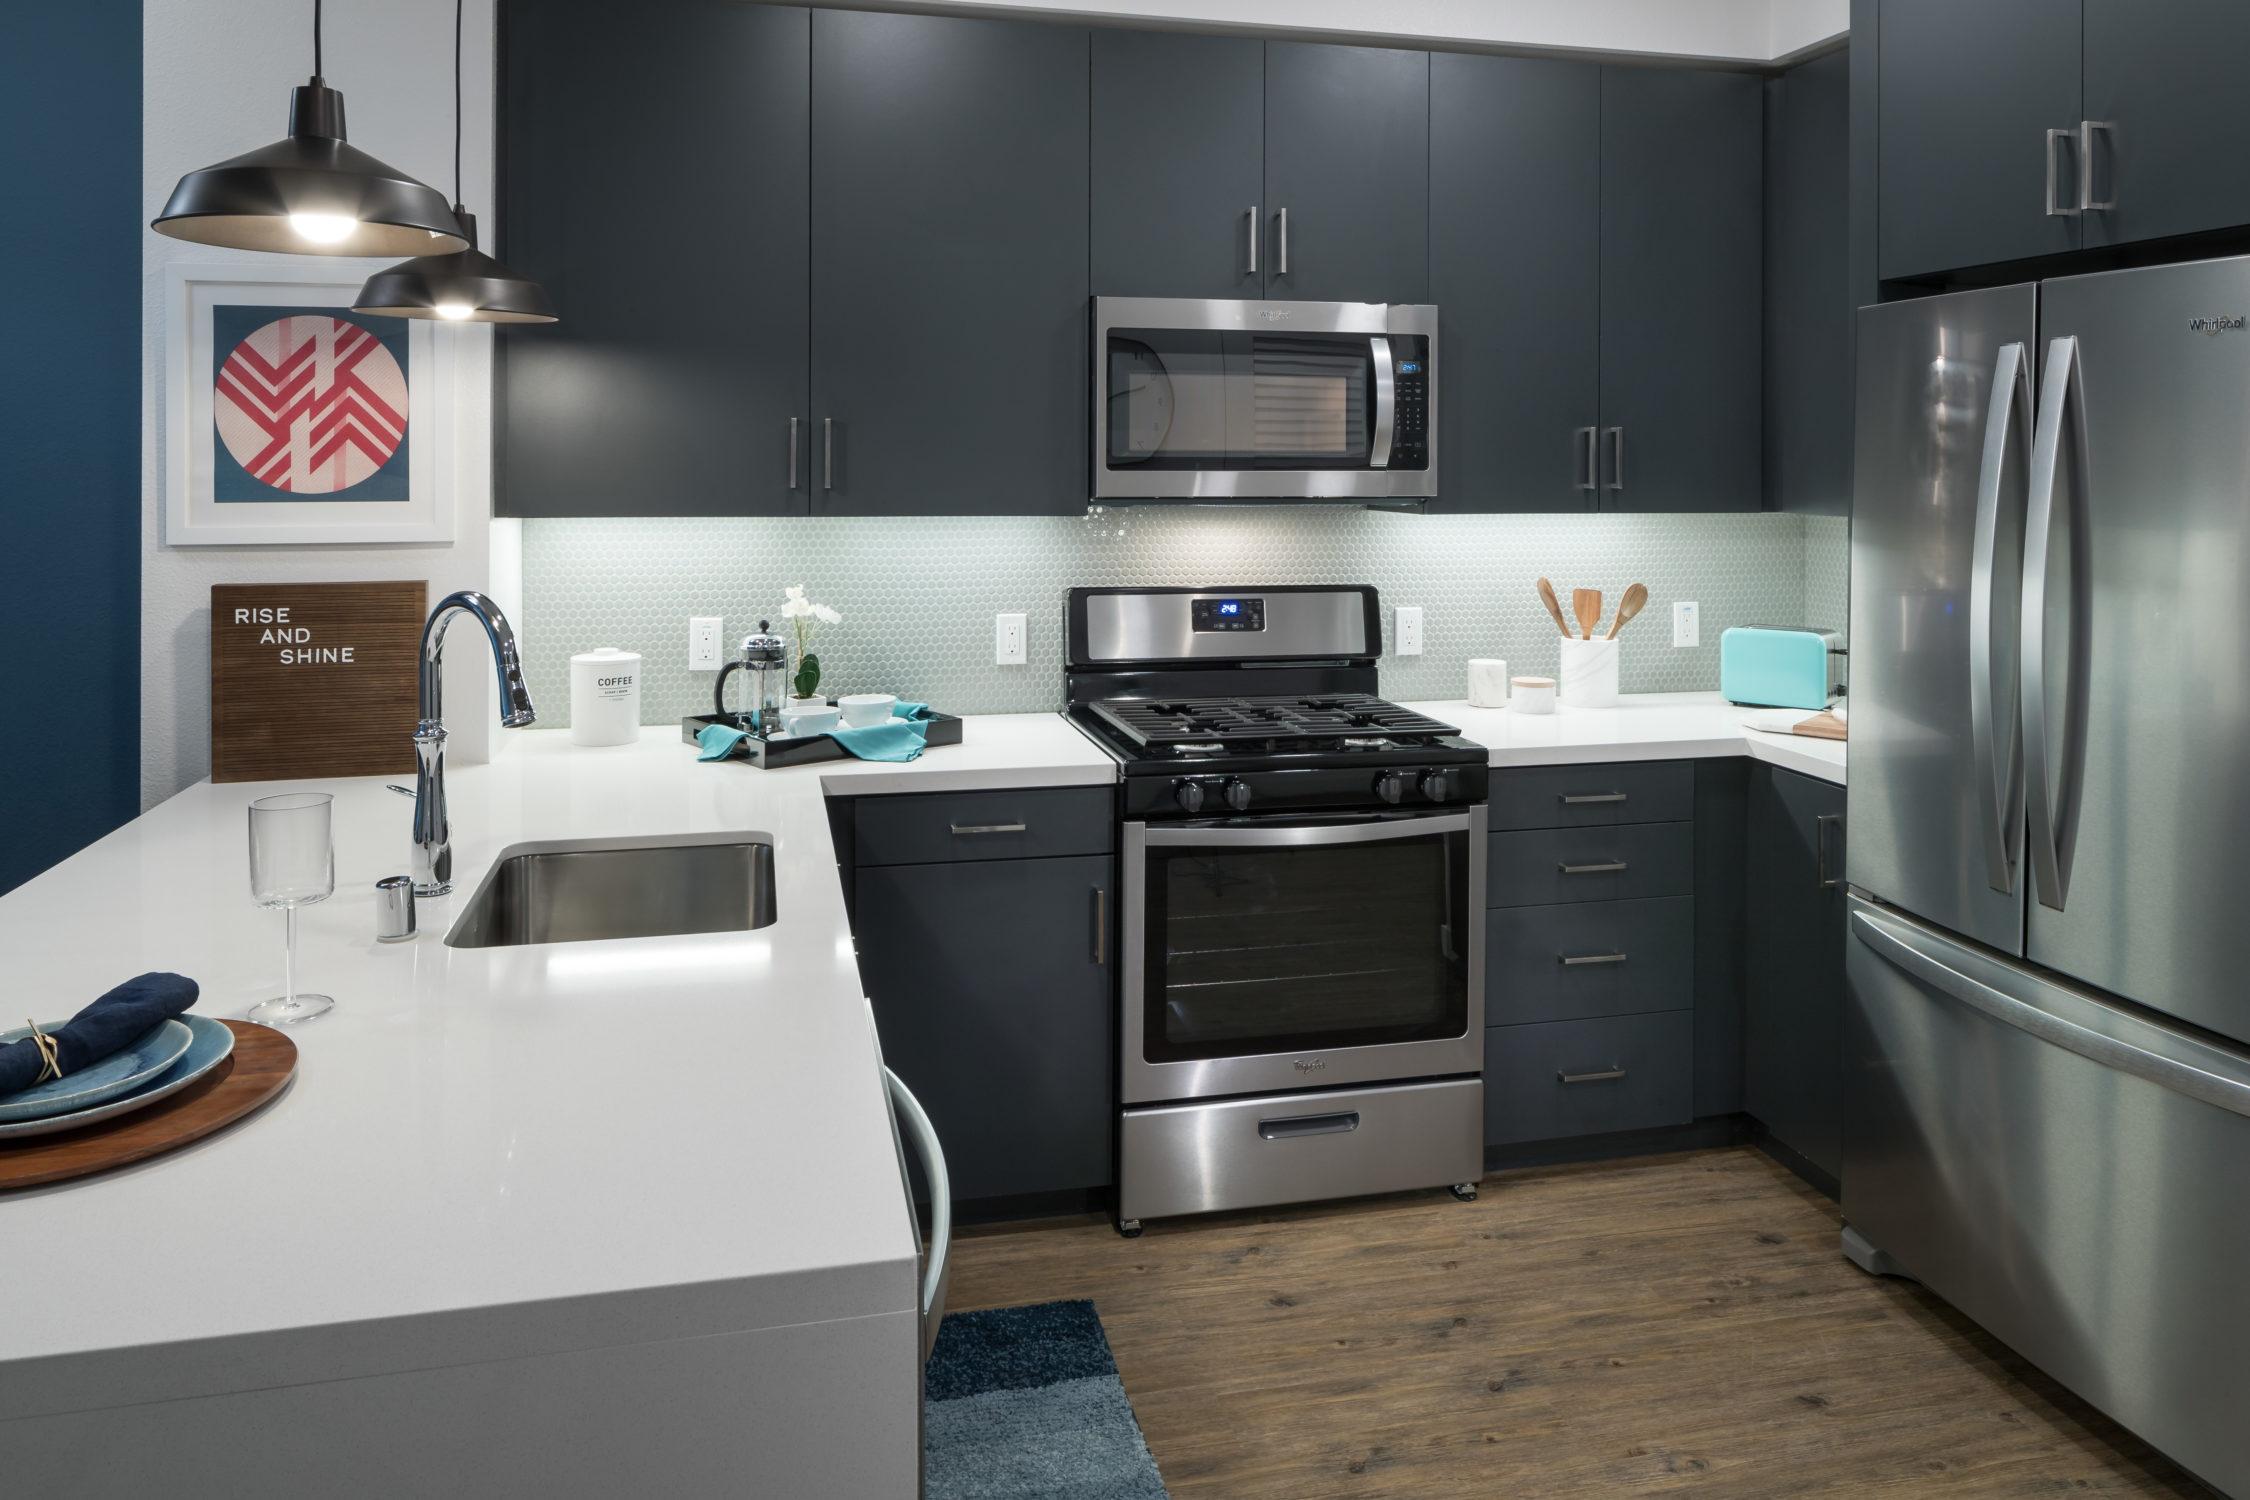 INT 02 Interior Kitchen TCRA 4193 505